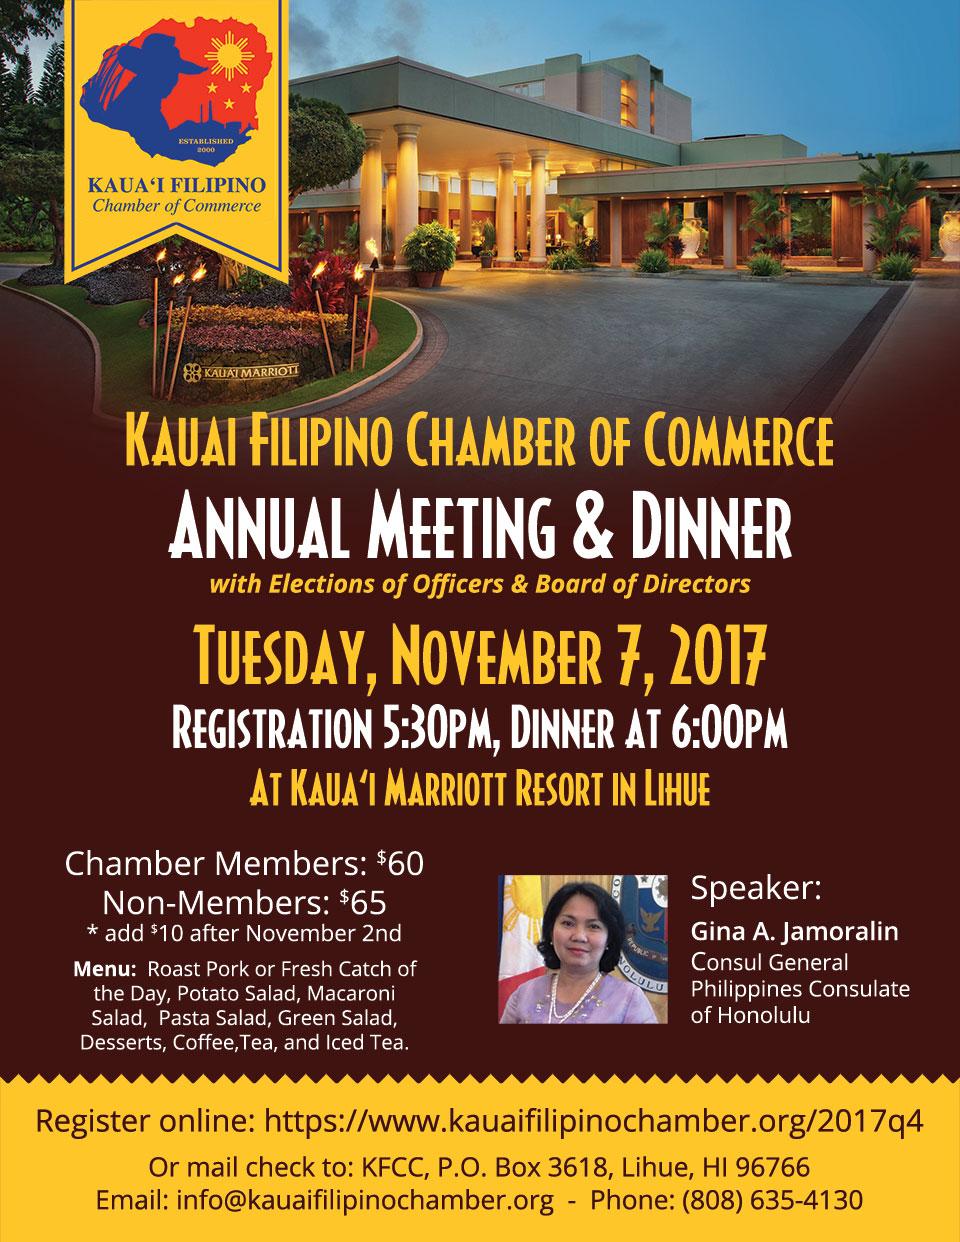 2017 Annual Membership Meeting & Dinner